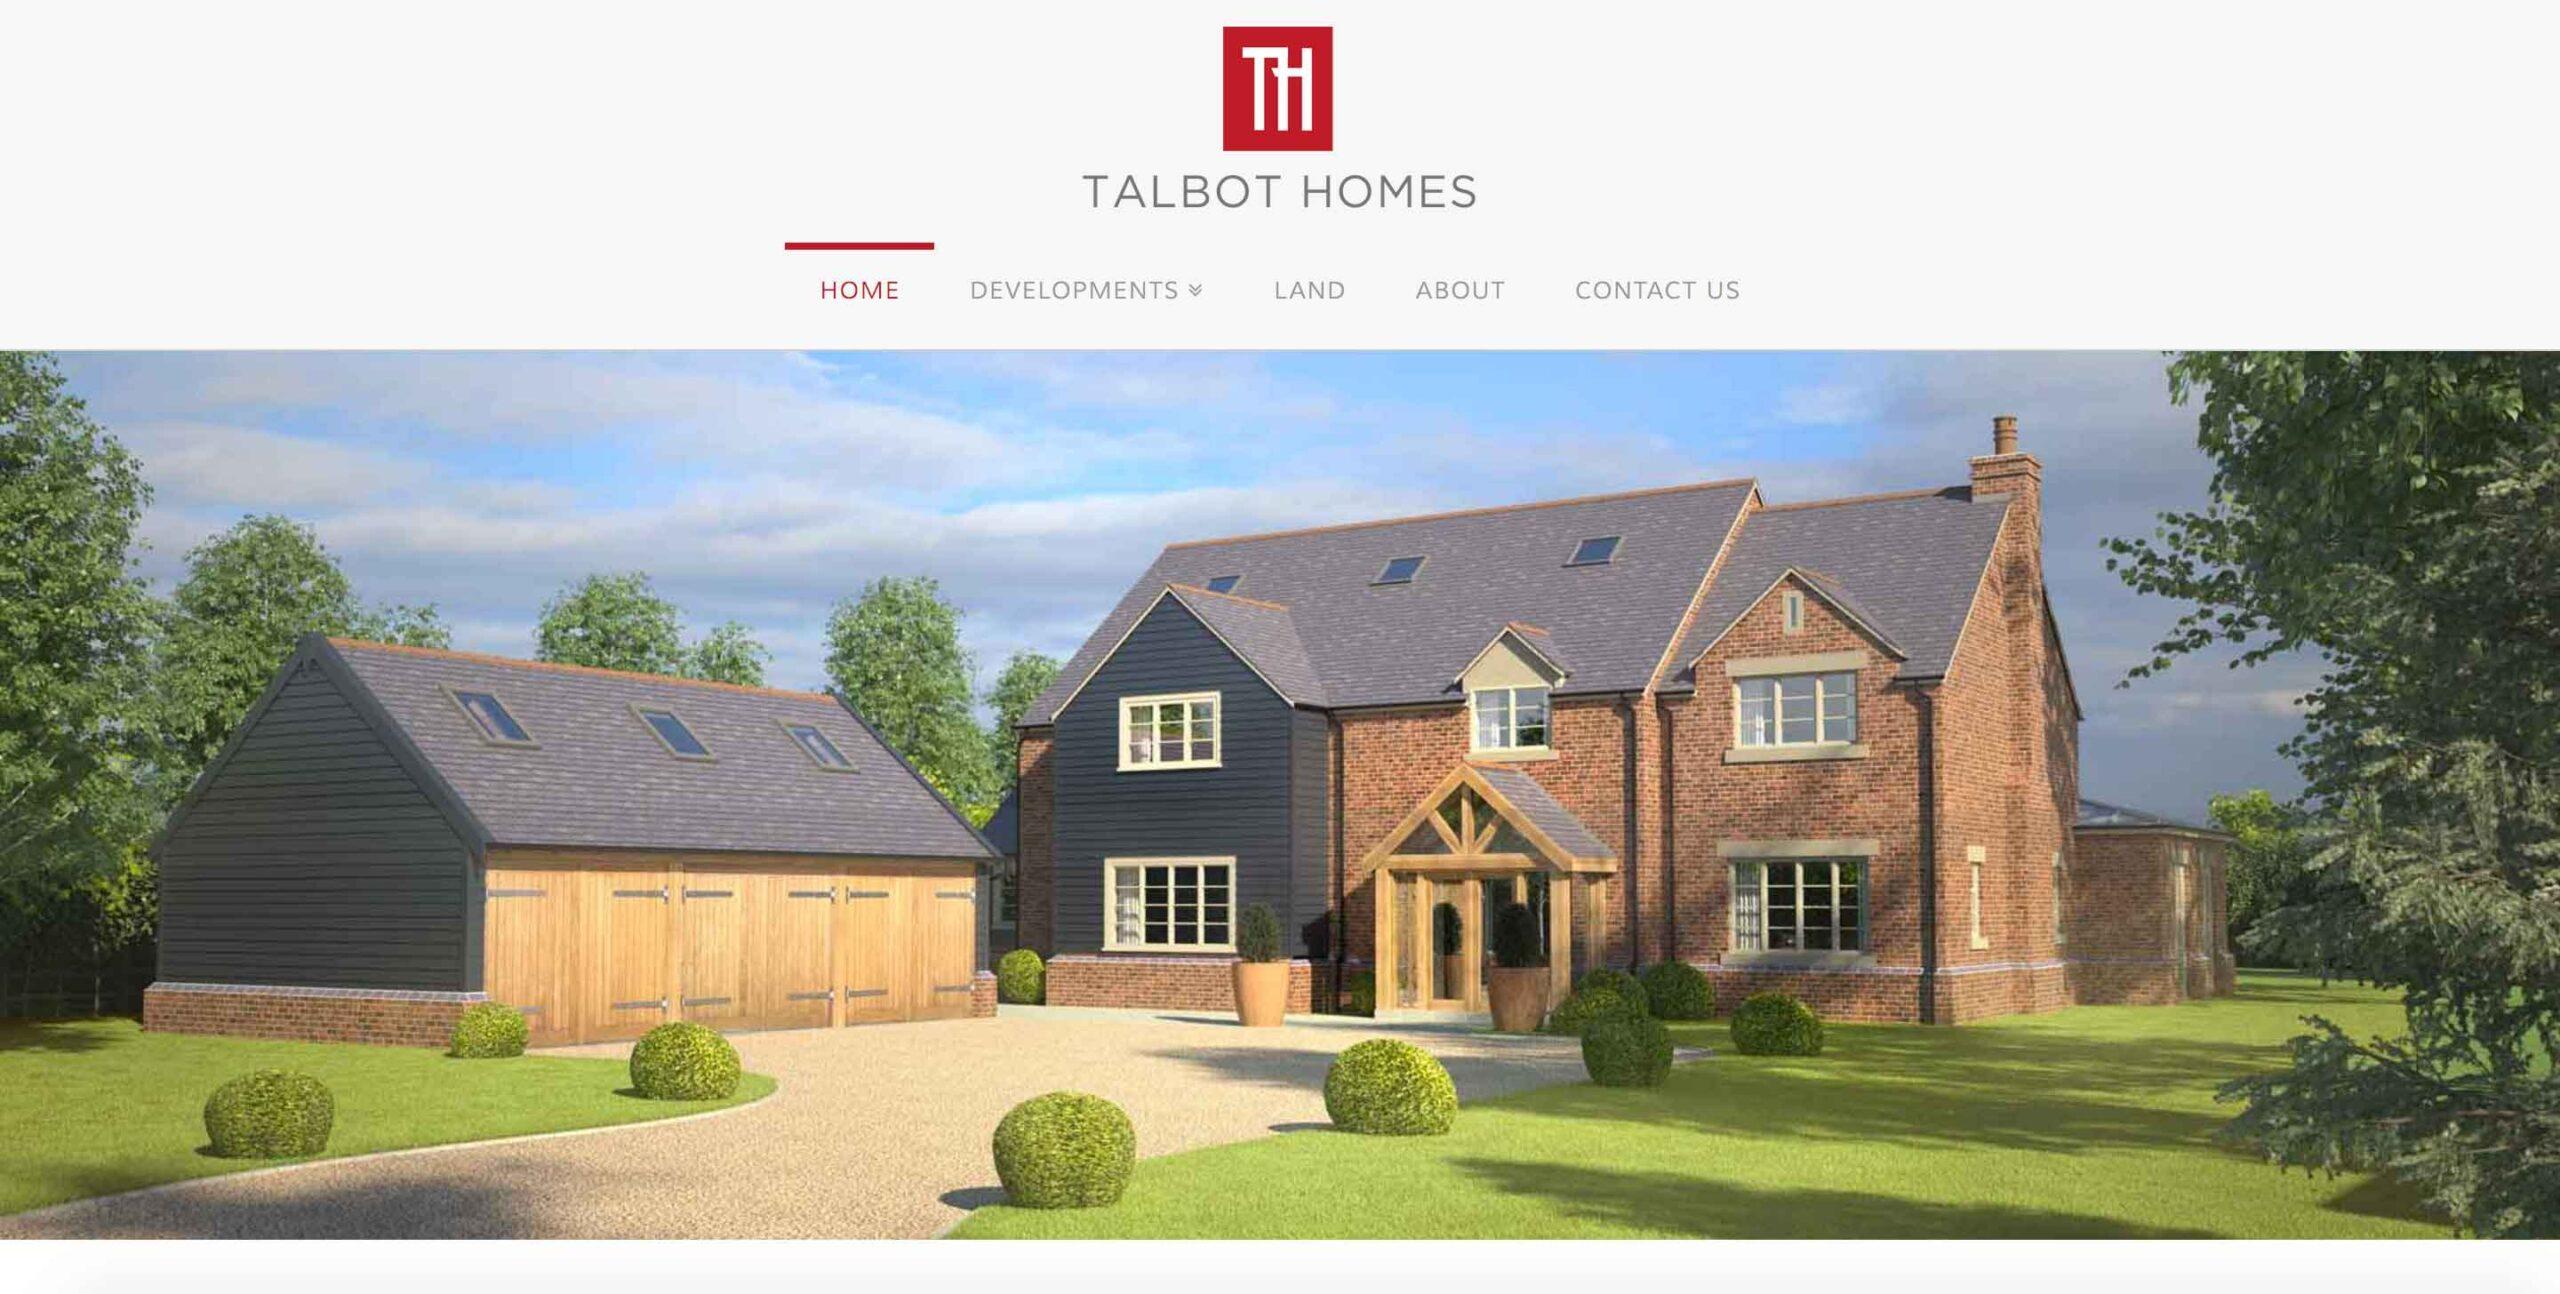 talbot homes website screenshot scaled